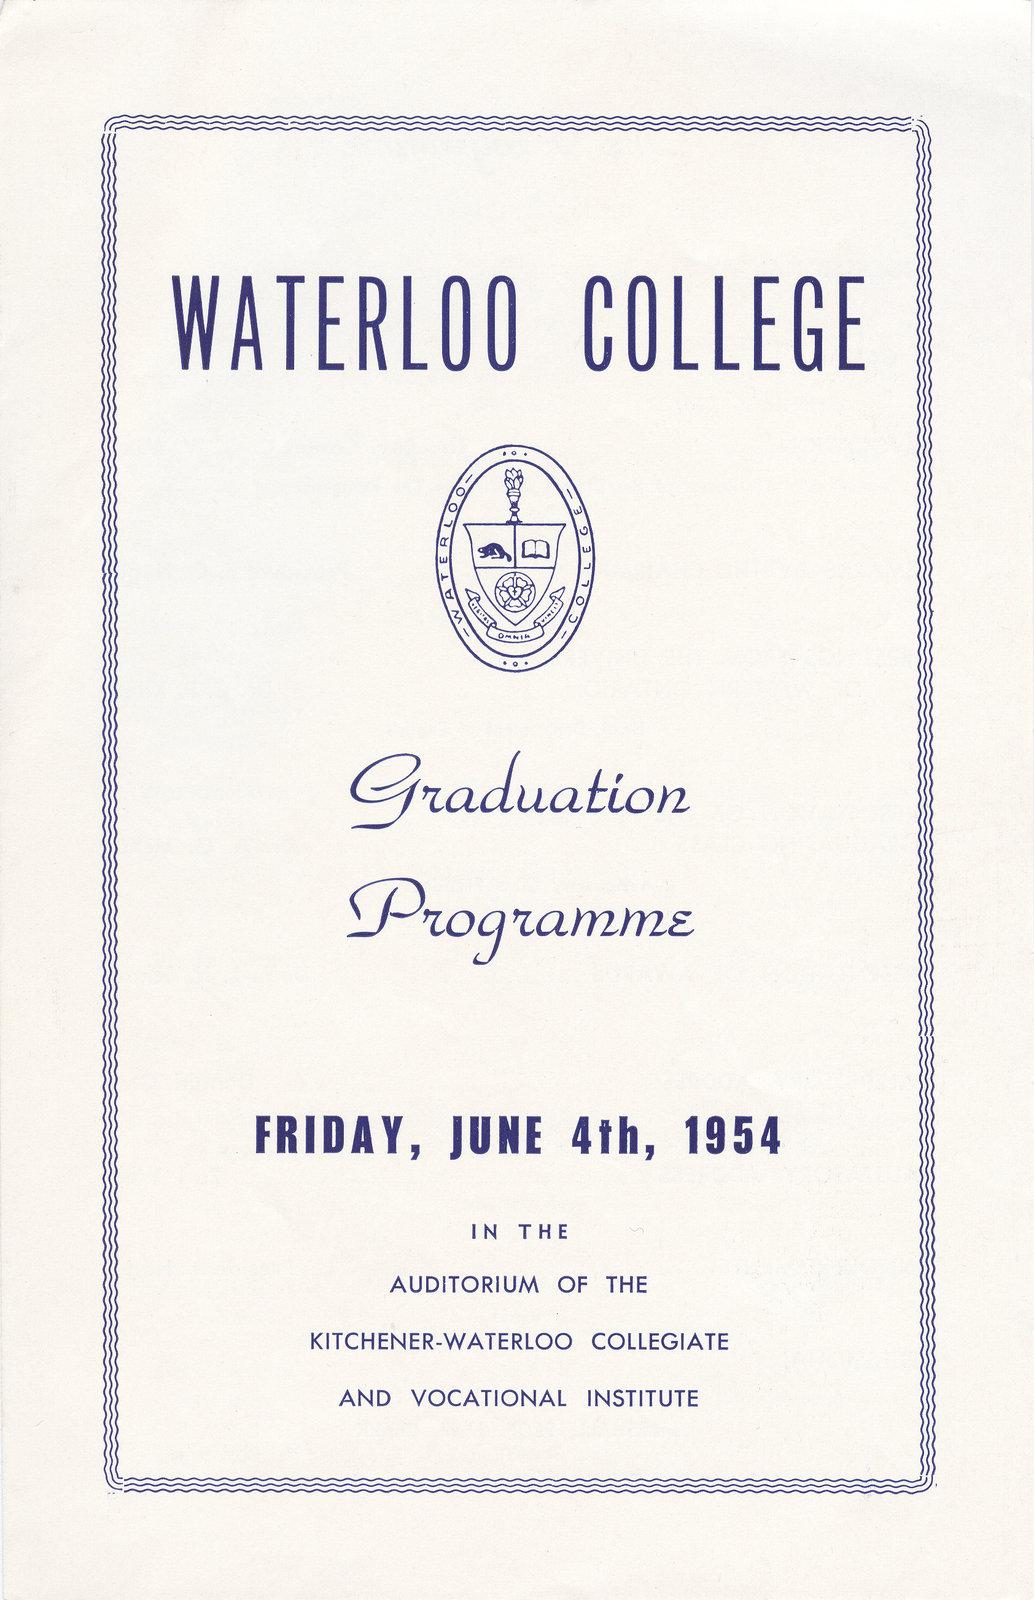 Waterloo College Graduation Programme, 1954